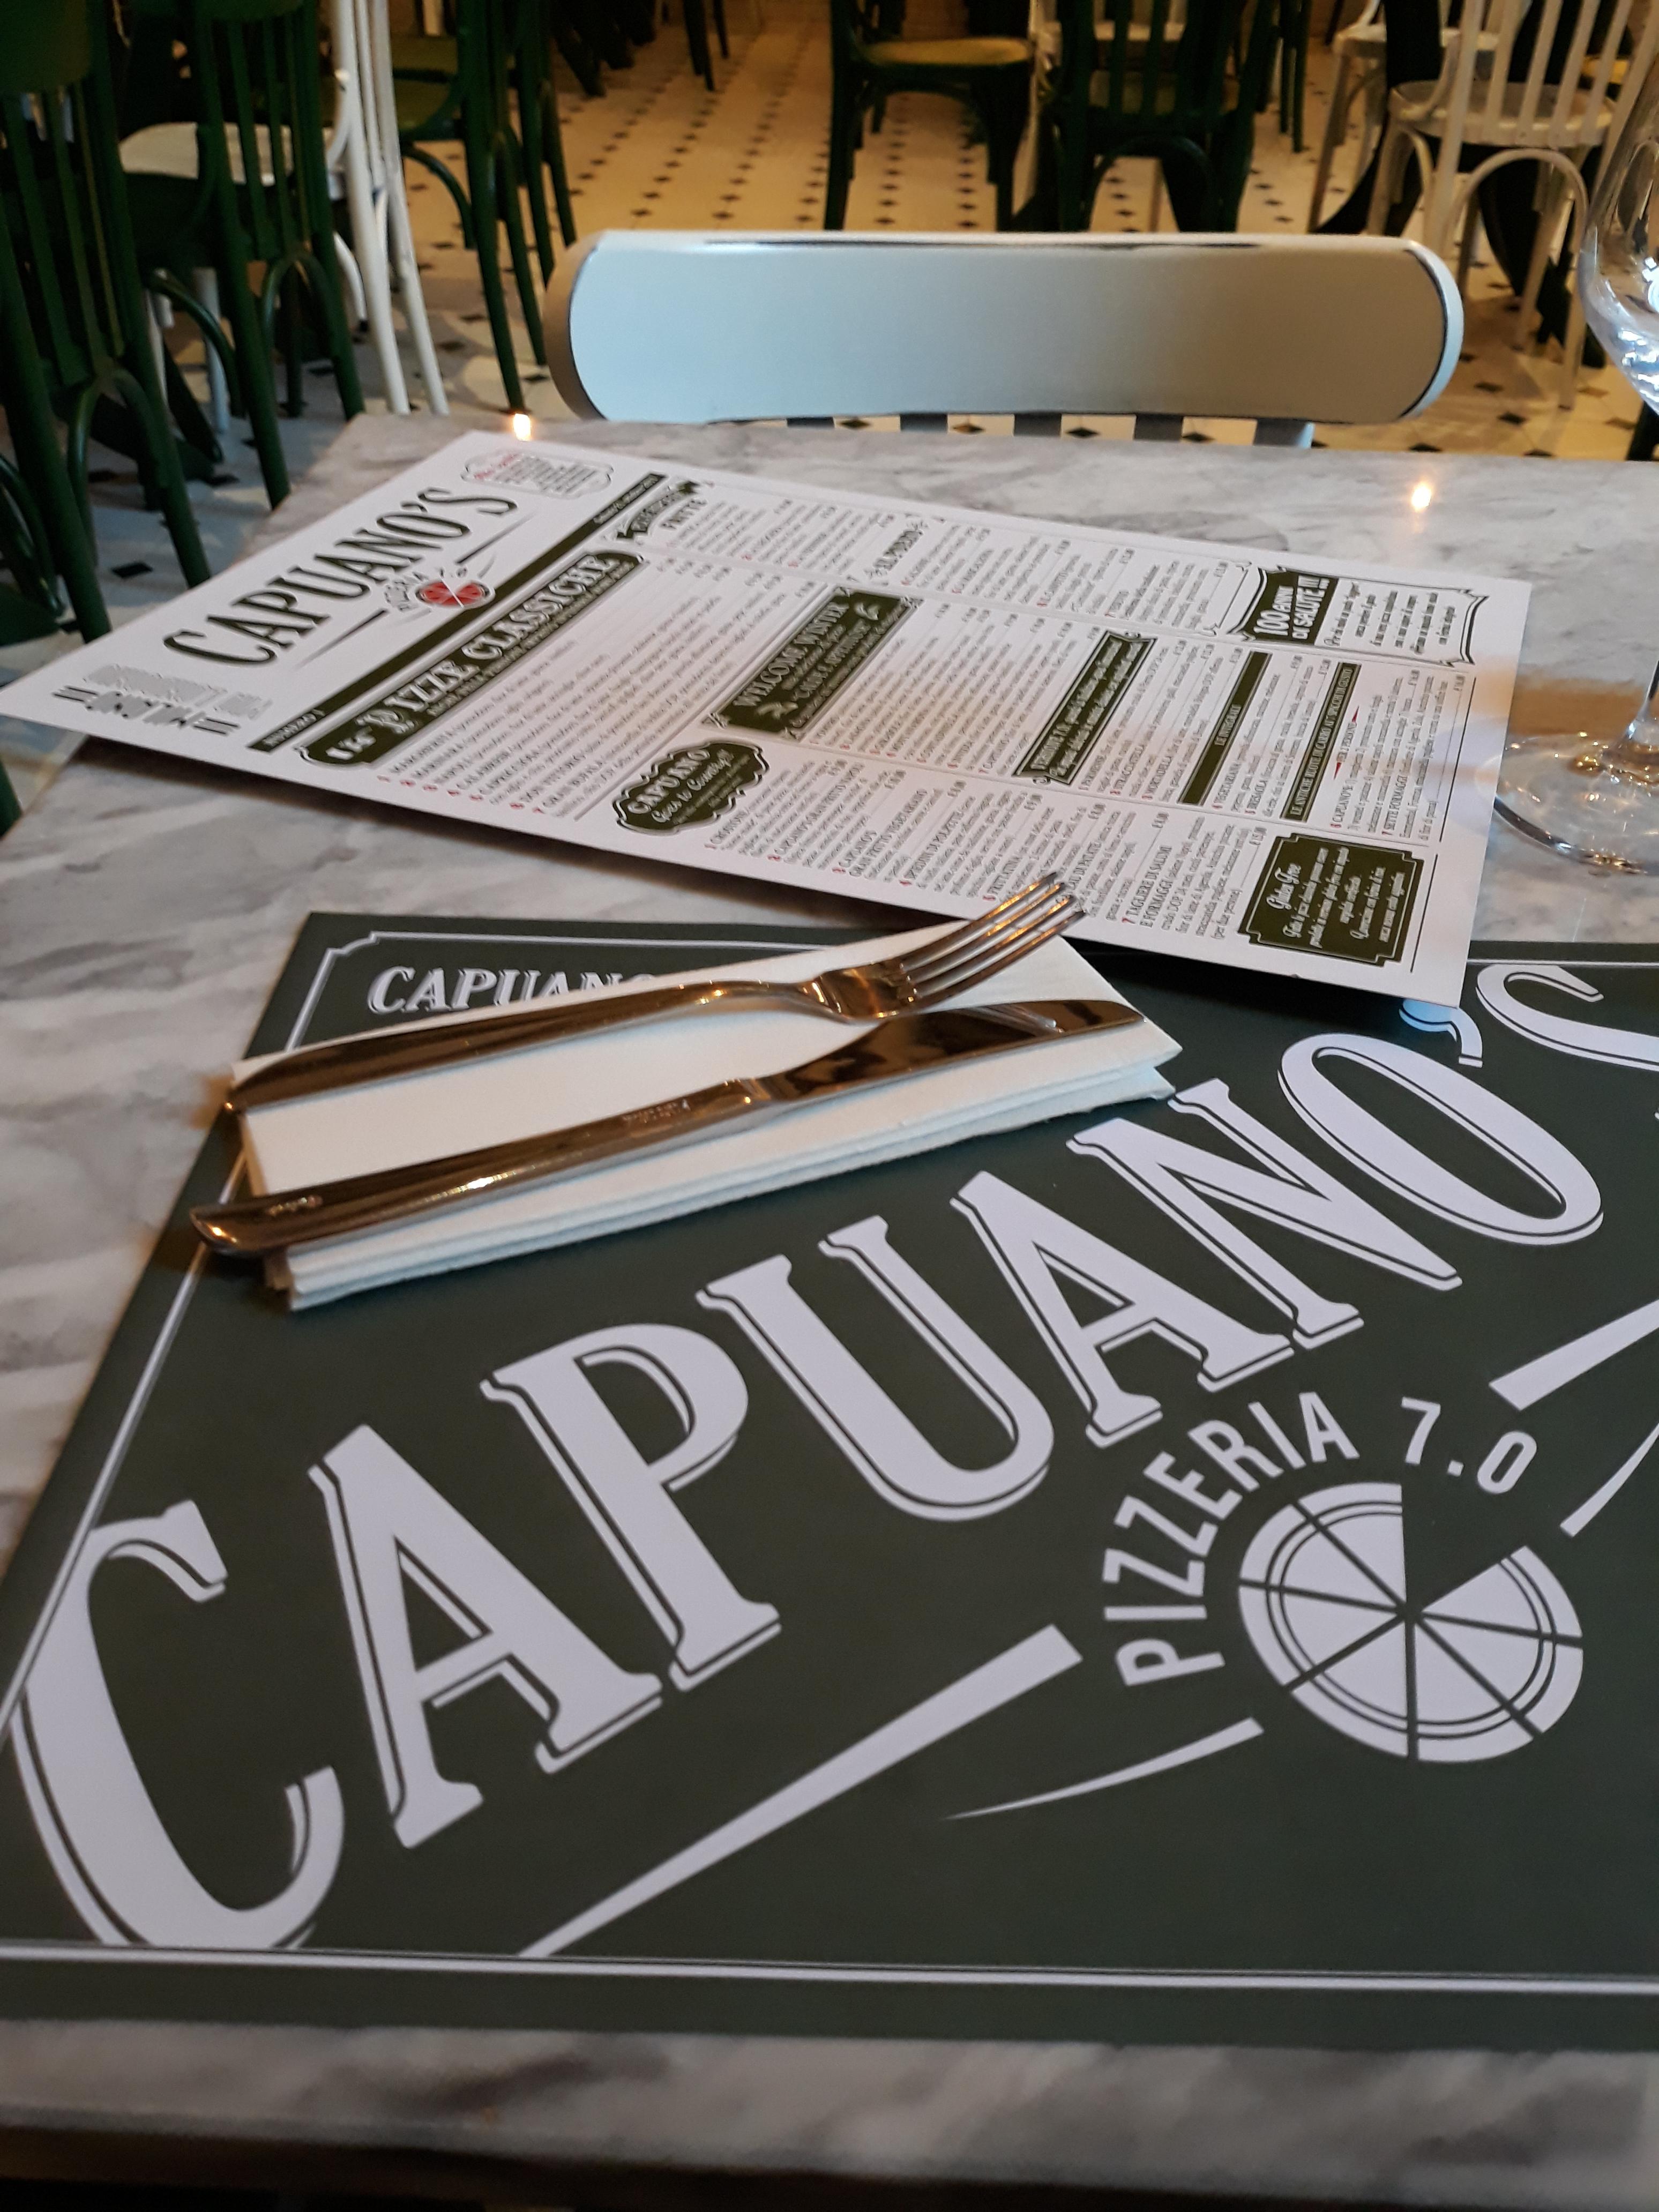 Pizzeria Capuano's